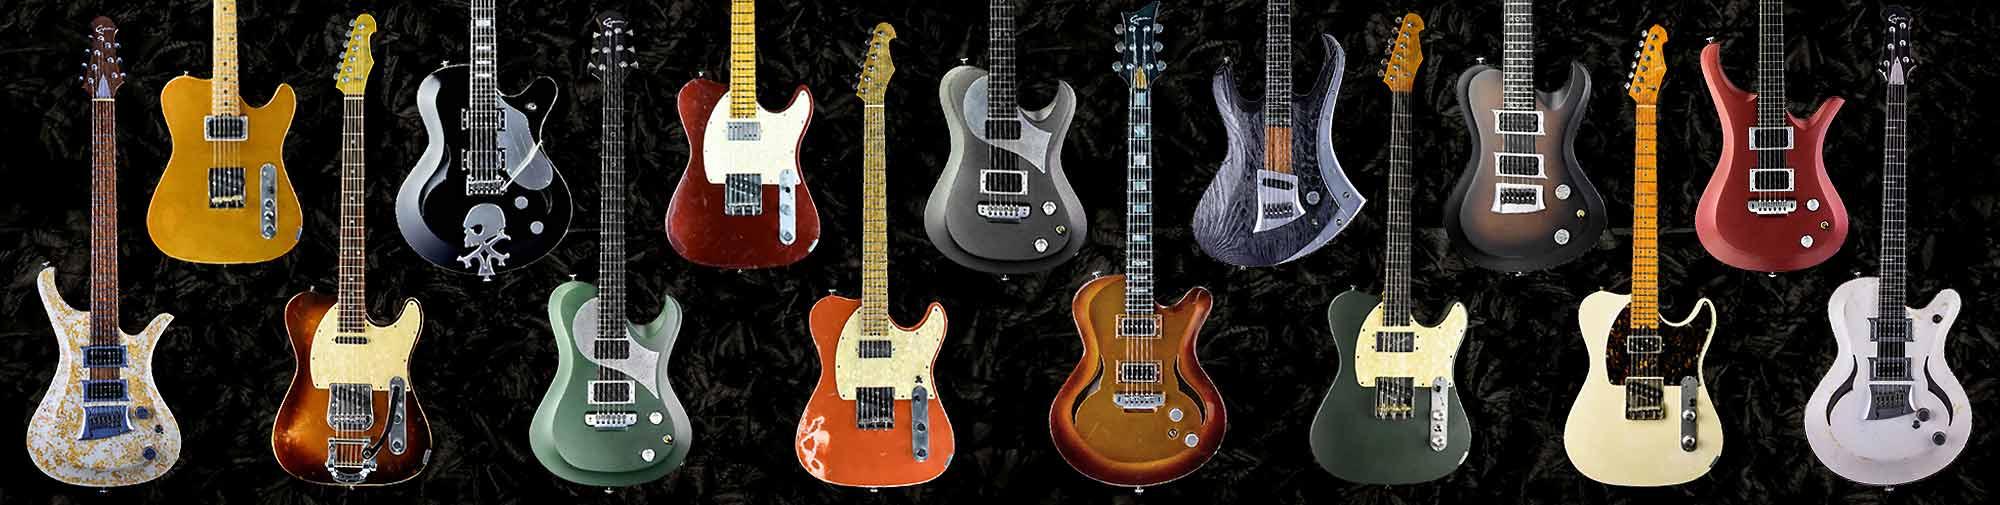 Cyan Custom Shop - guitars in stock